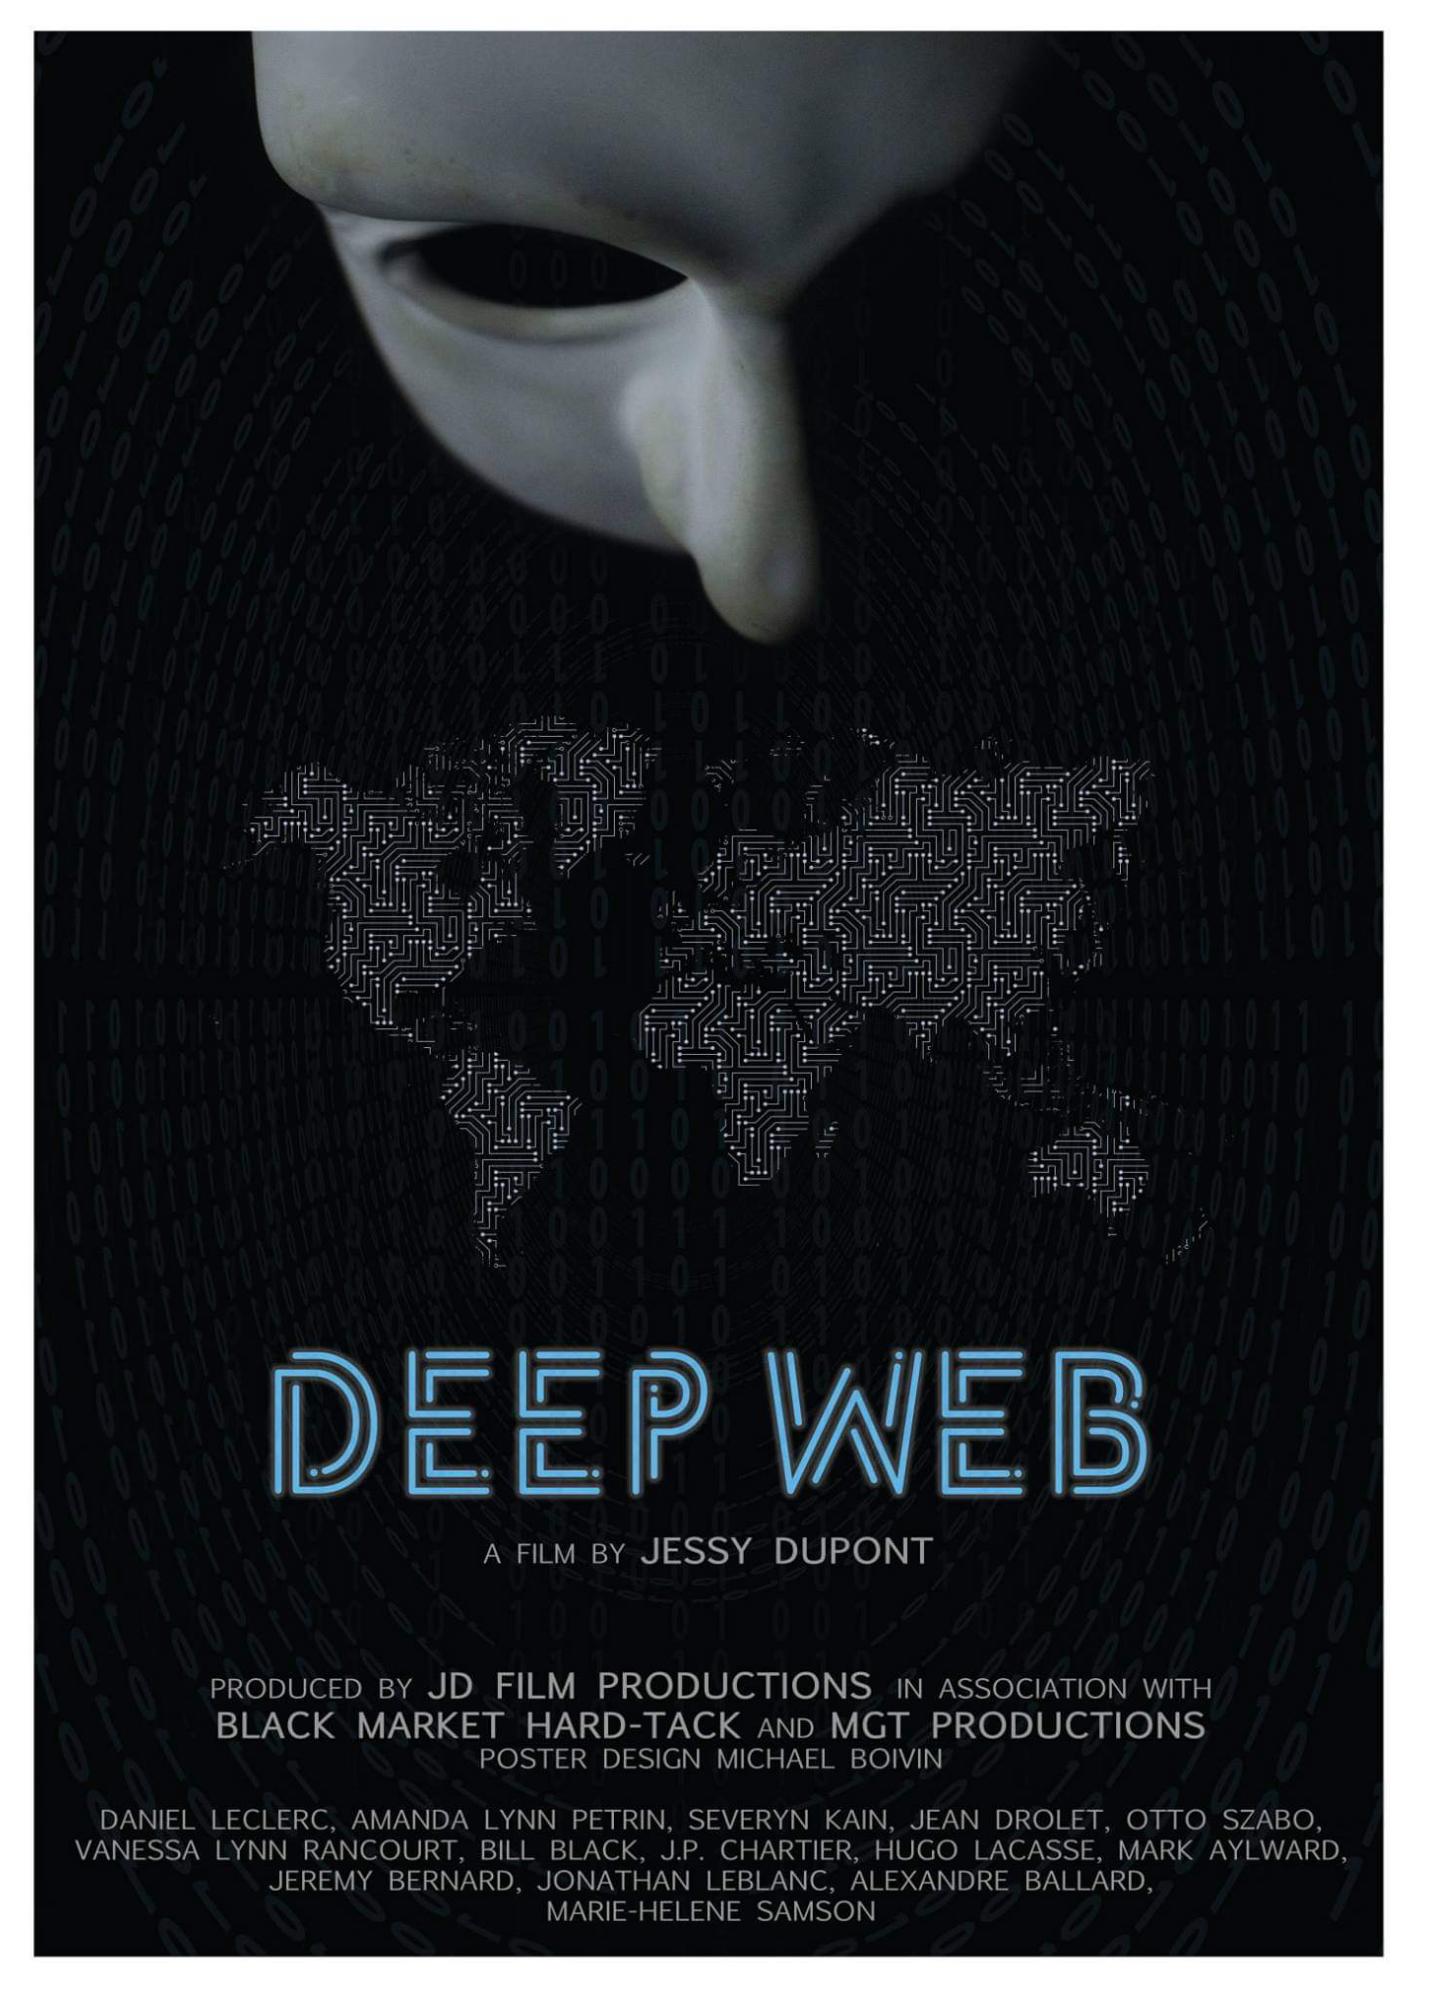 Deep web affiche film